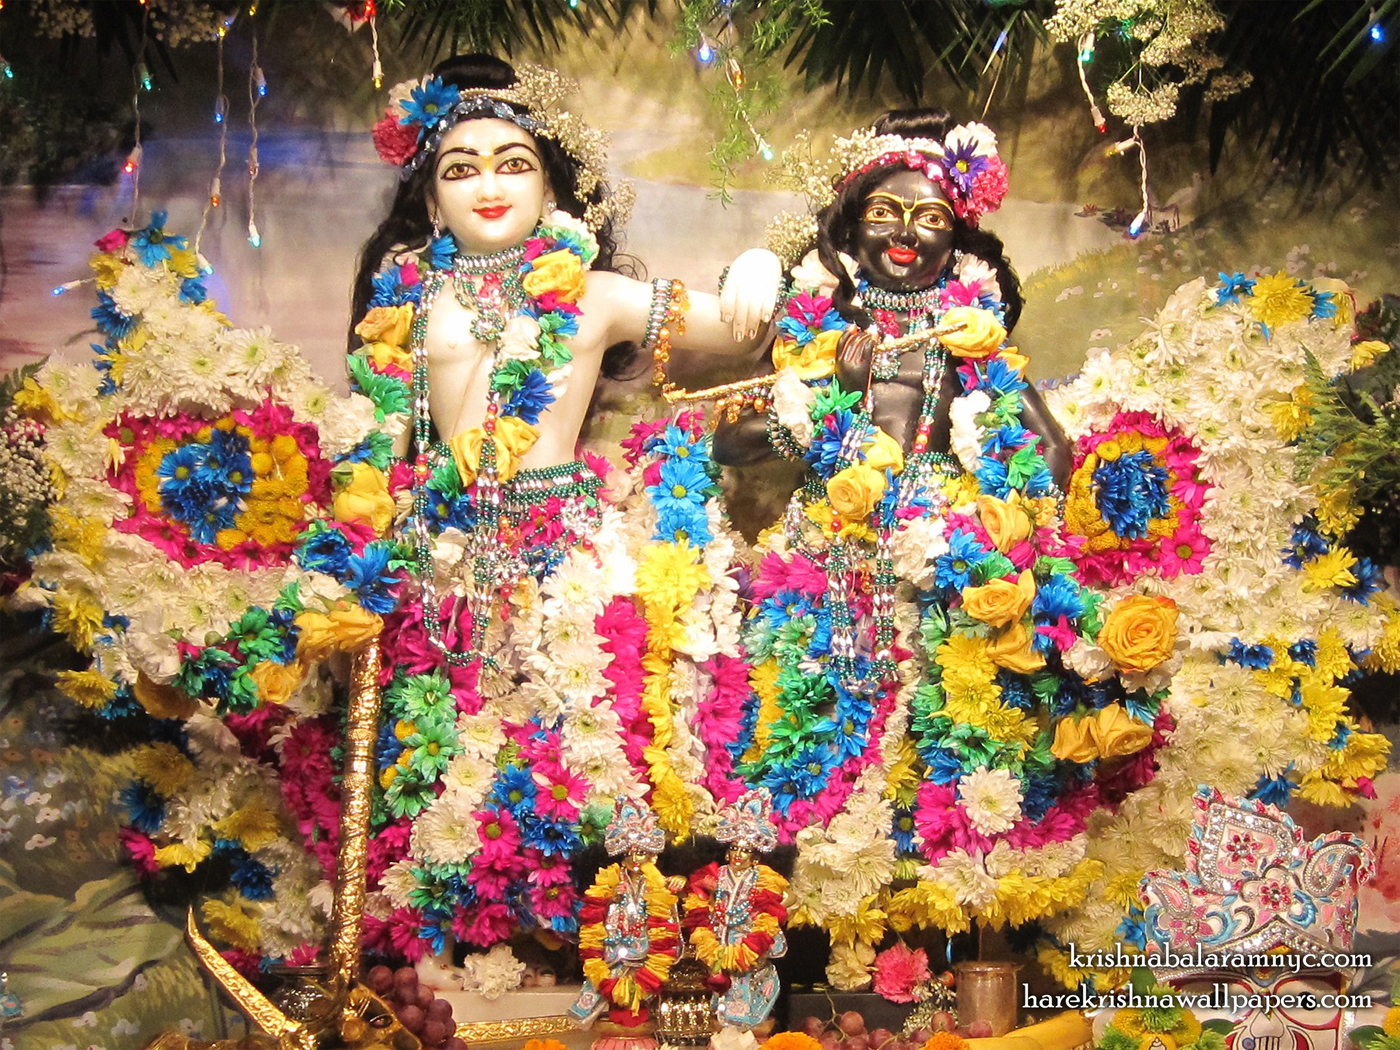 Sri Sri Hari Haladhari Wallpaper (002) Size 1400x1050 Download